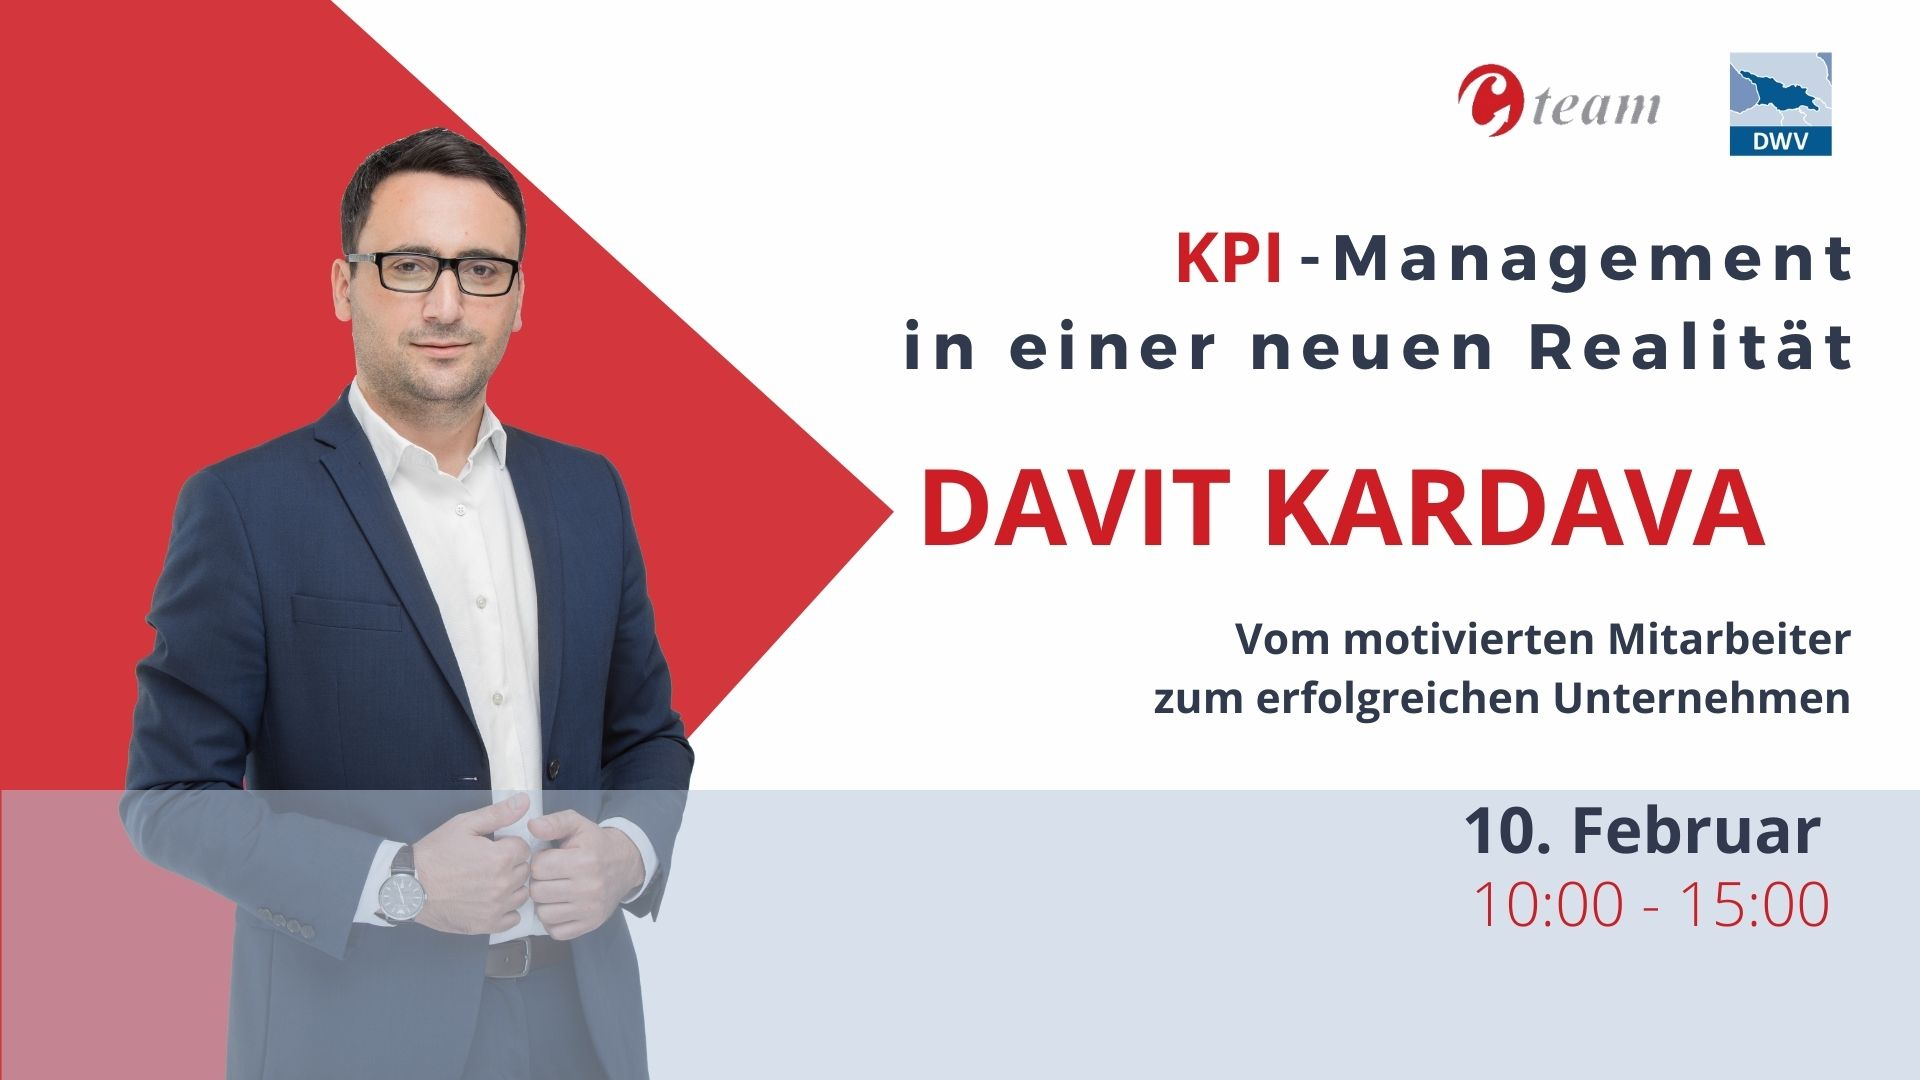 DWV-Training-Cteam-Kardava-KPI-Management